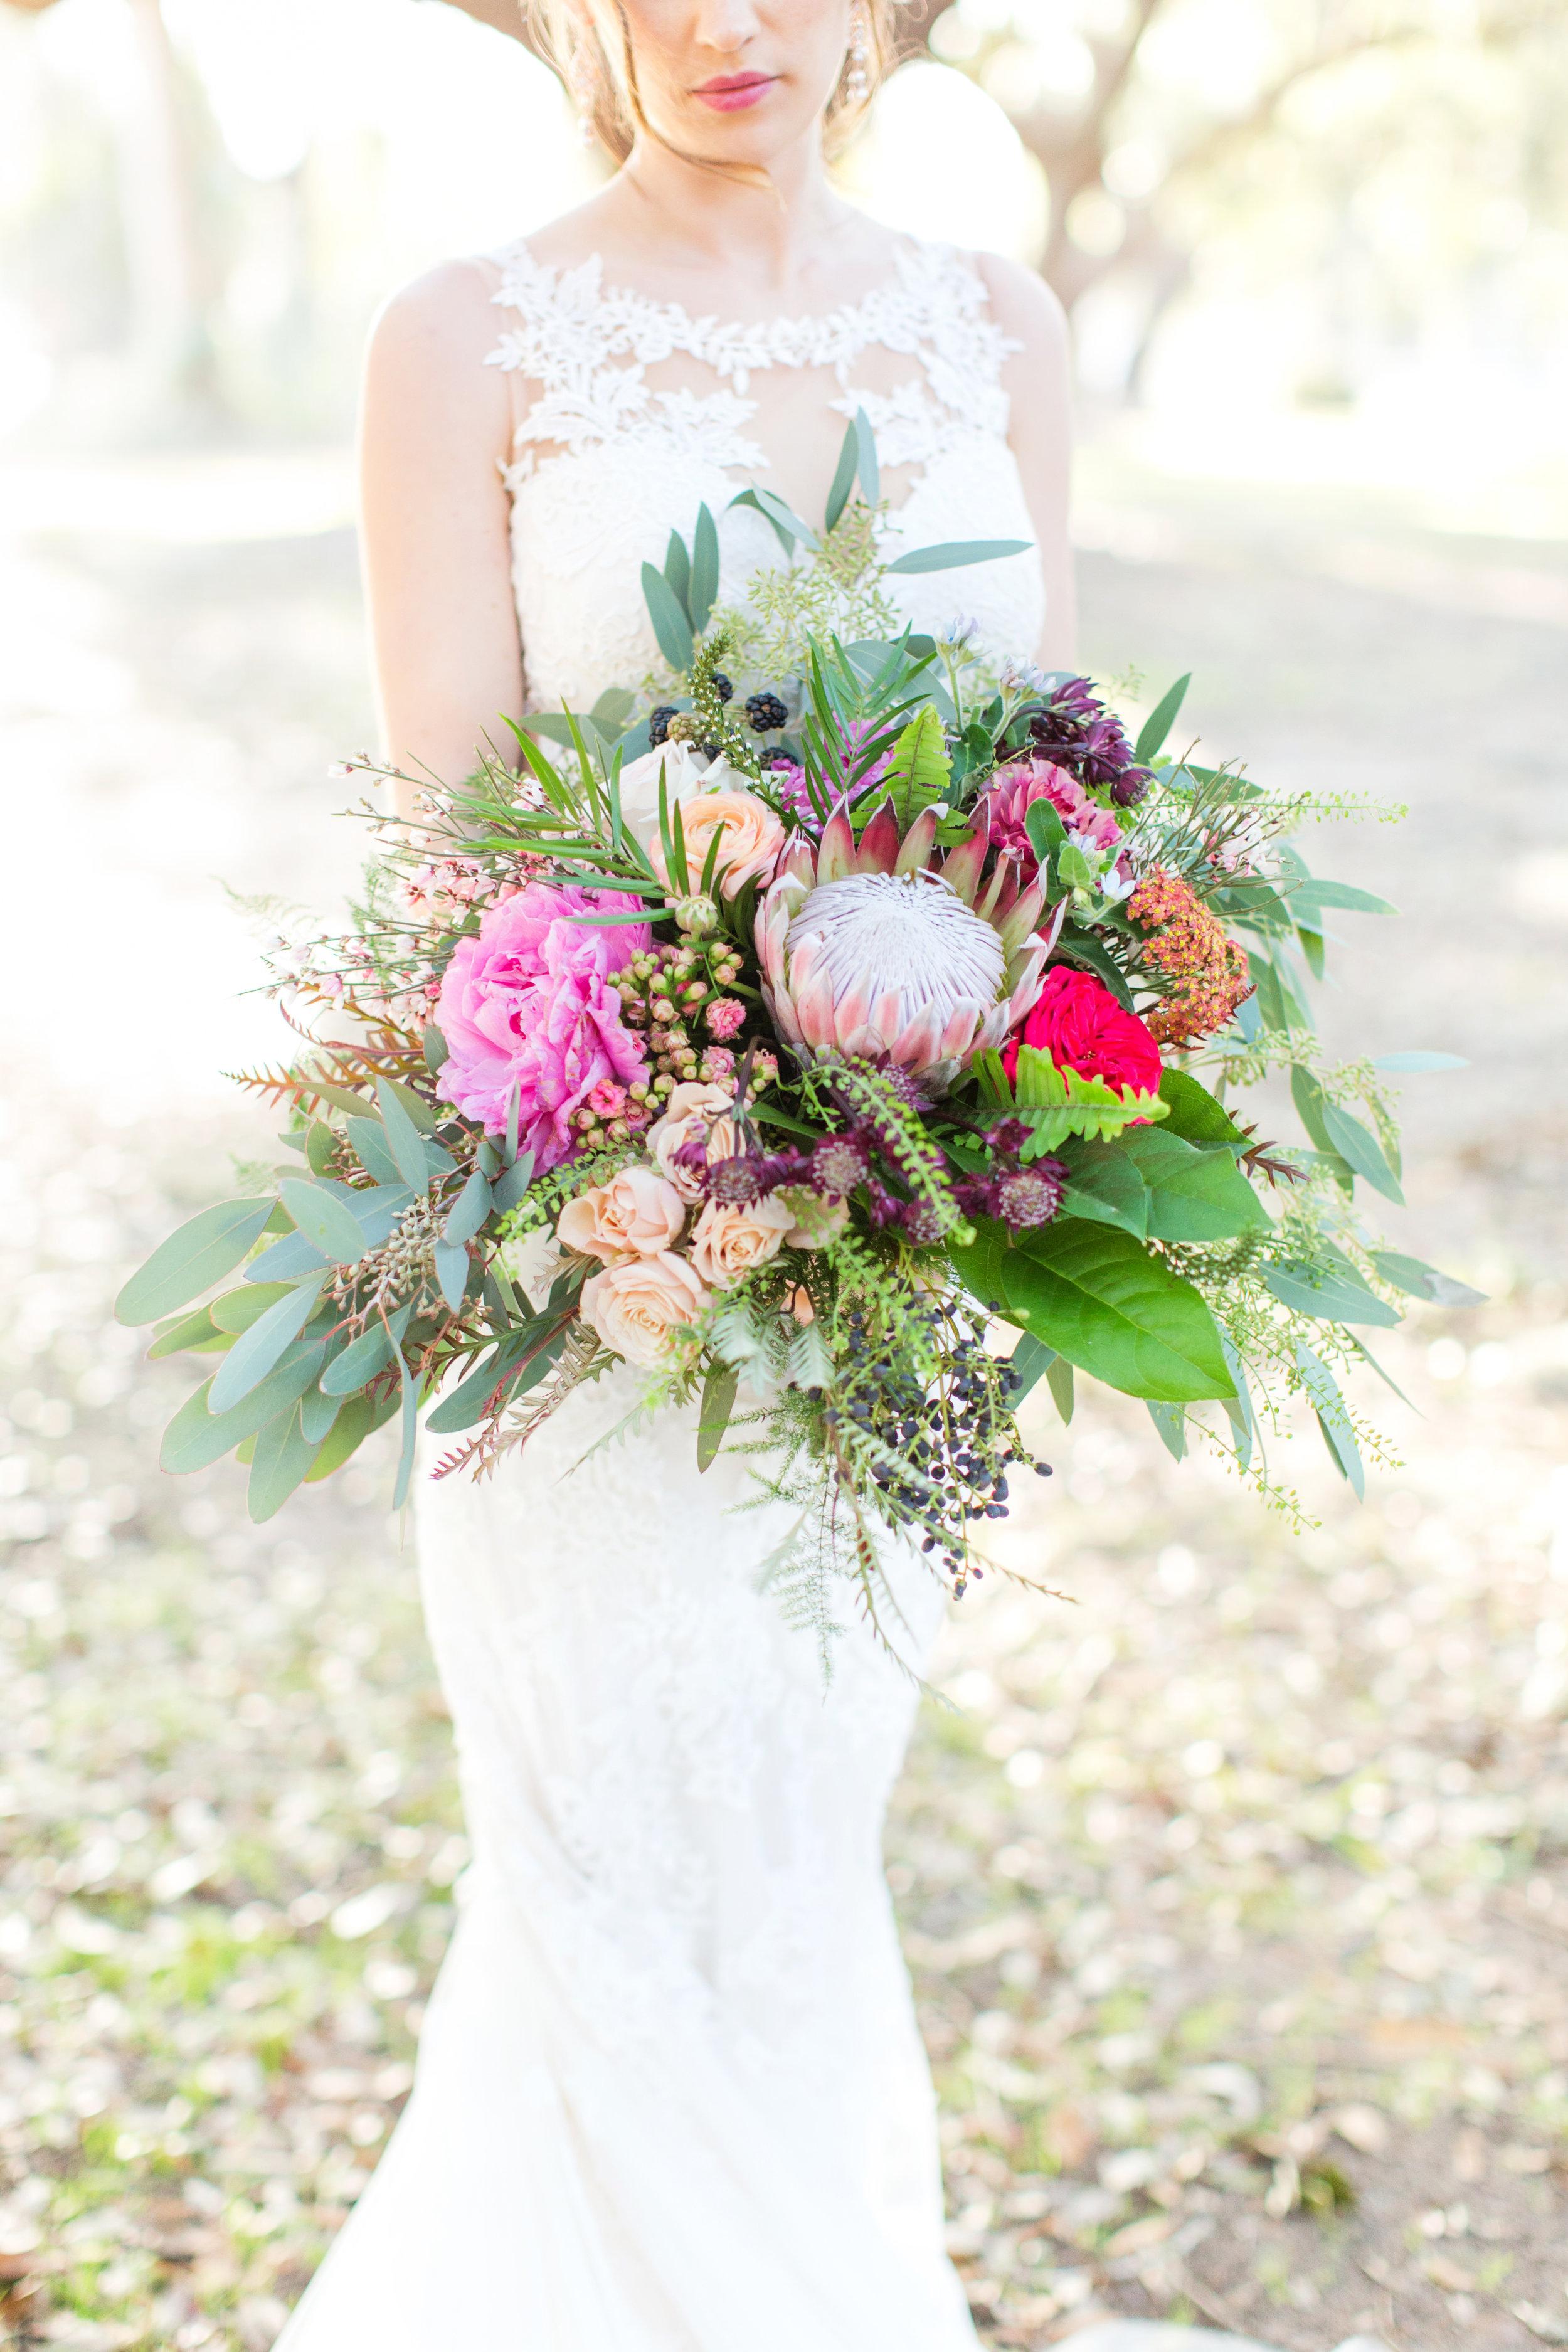 WeddingsatSunnysidePlantation-MagnoliaPhotography-19.jpg